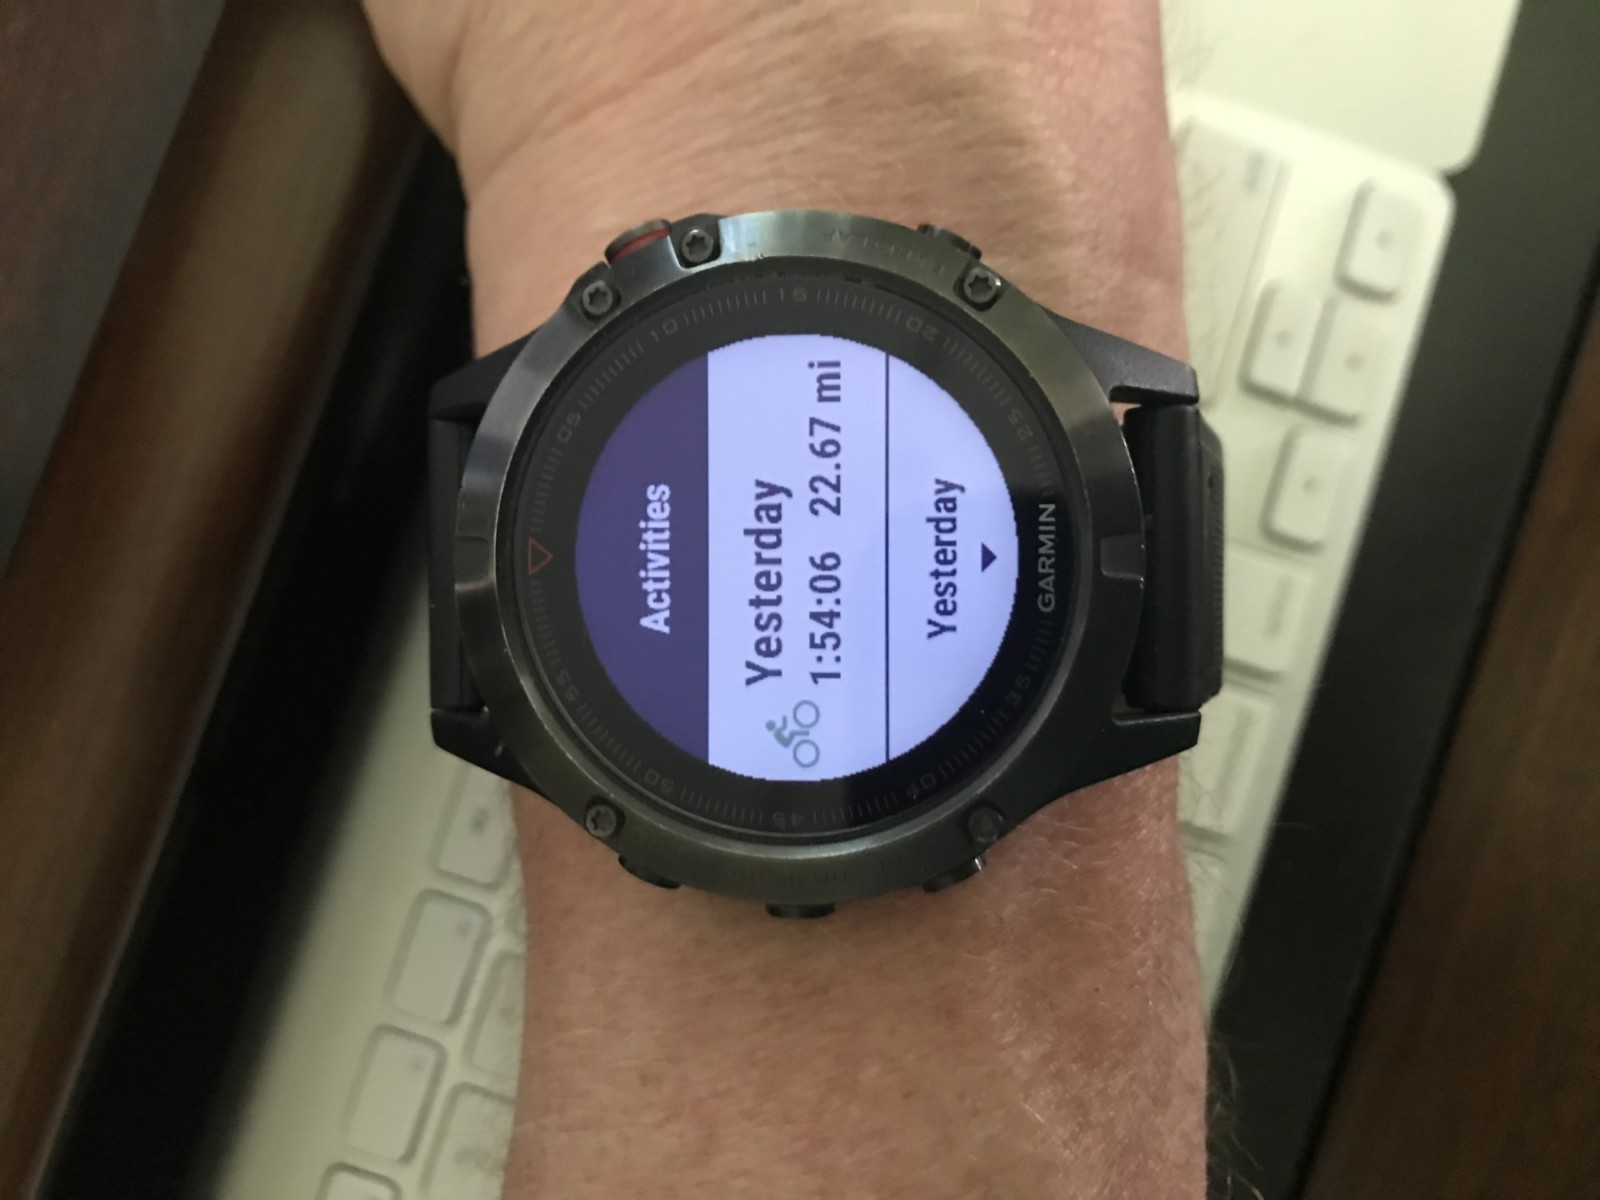 Garmin's new TrueUp multi-device activity tracking sync